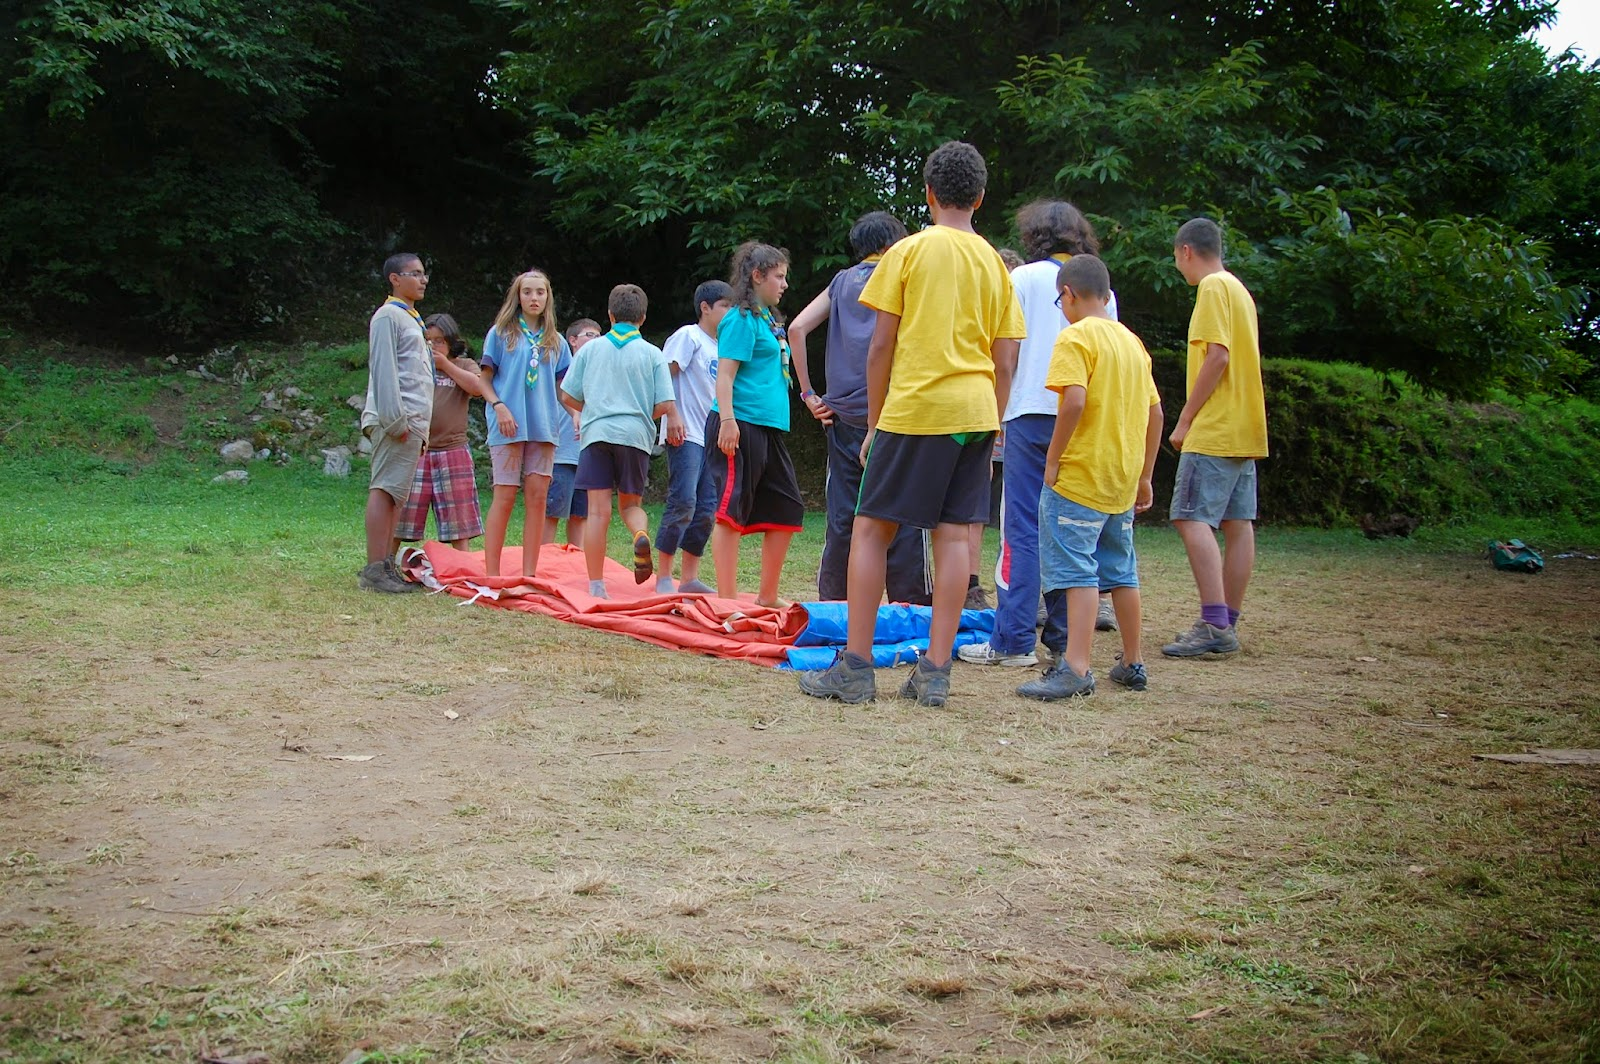 Campaments Estiu RolandKing 2011 - DSC_0347%2B2.JPG